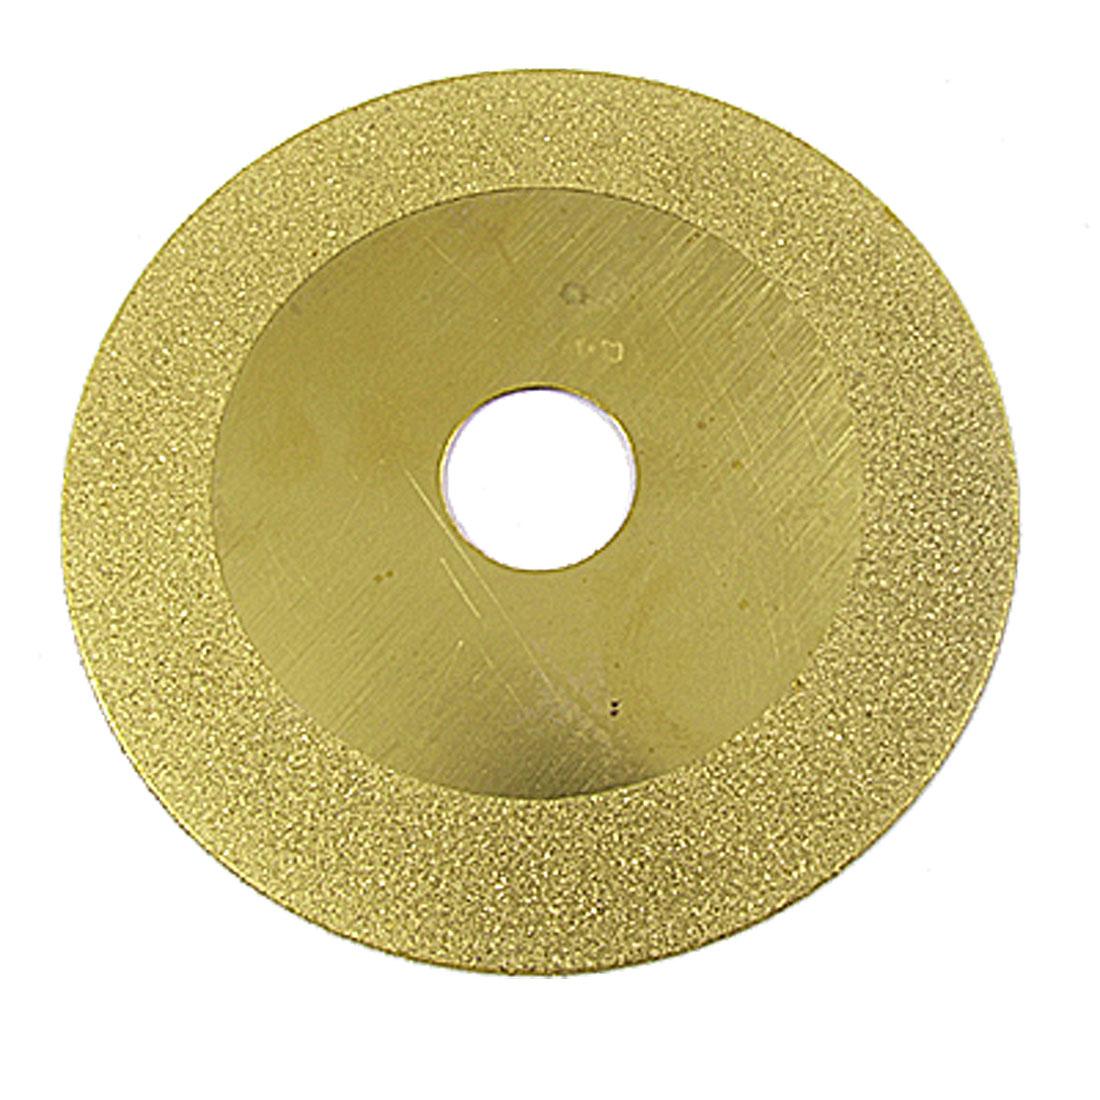 "4"" Diamond Coated Glass Grinding Grind Disc Wheel Gold Tone"